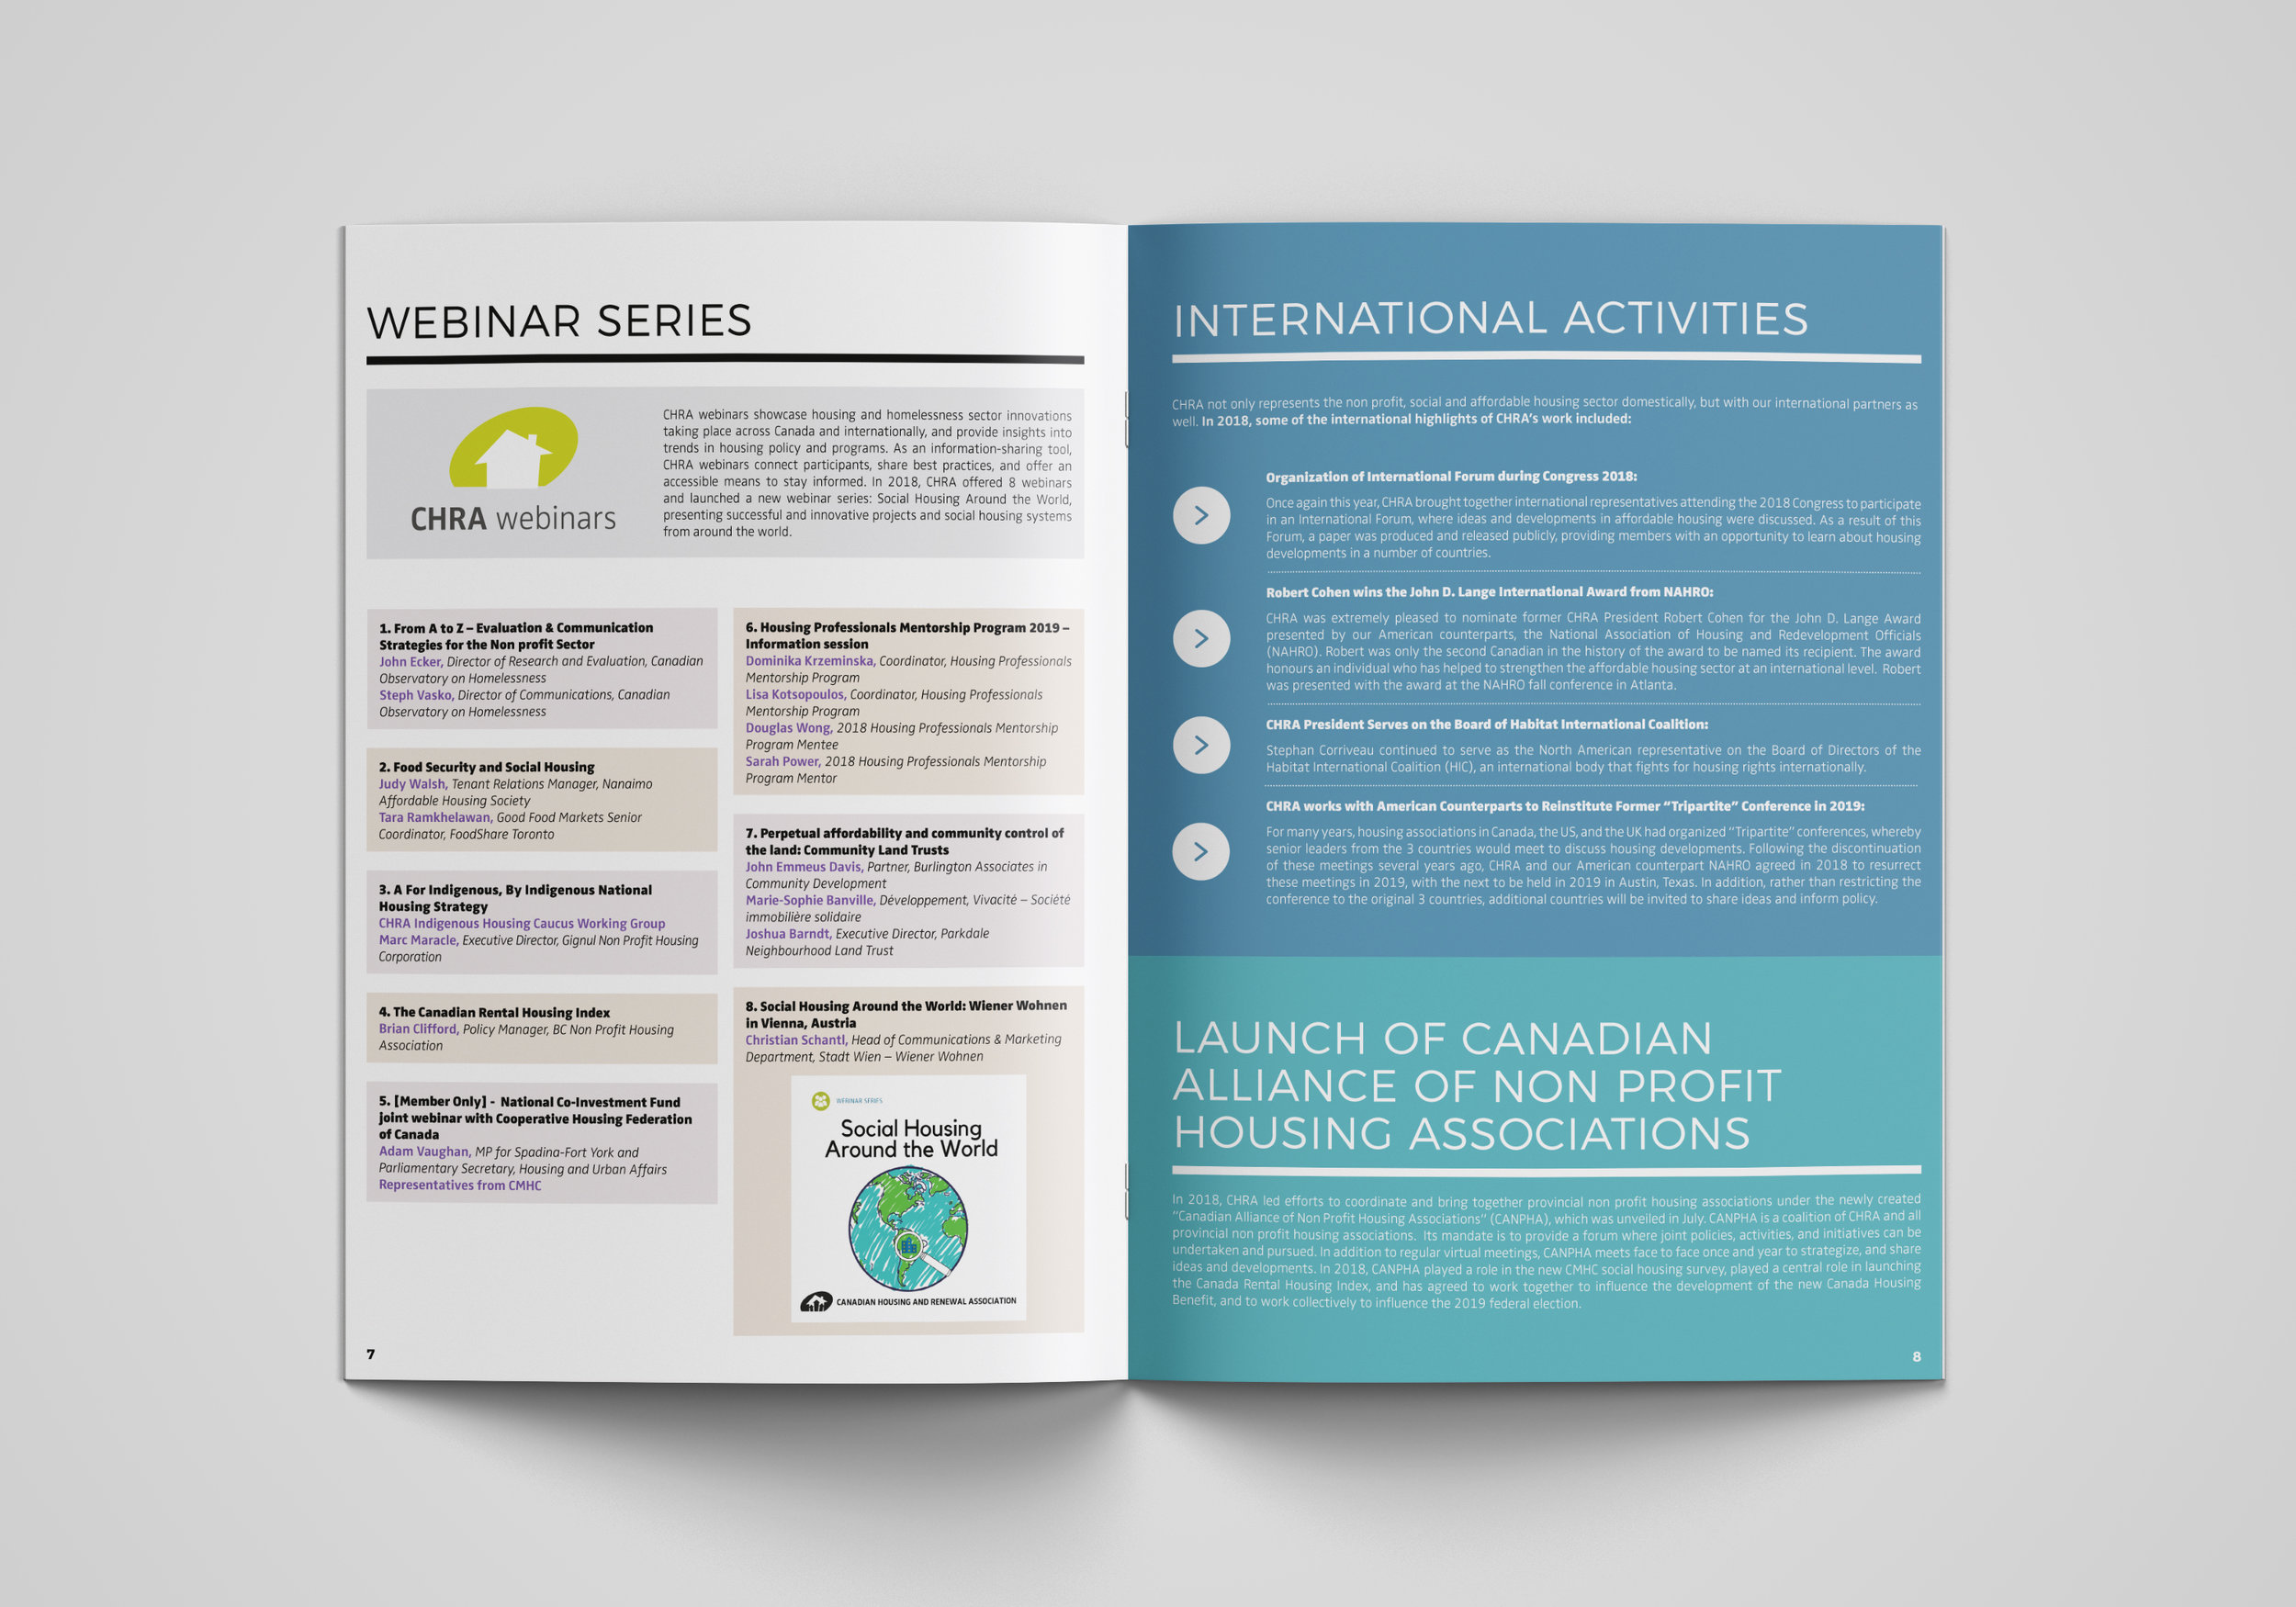 2018 Annual Report Webinars and International Activities.